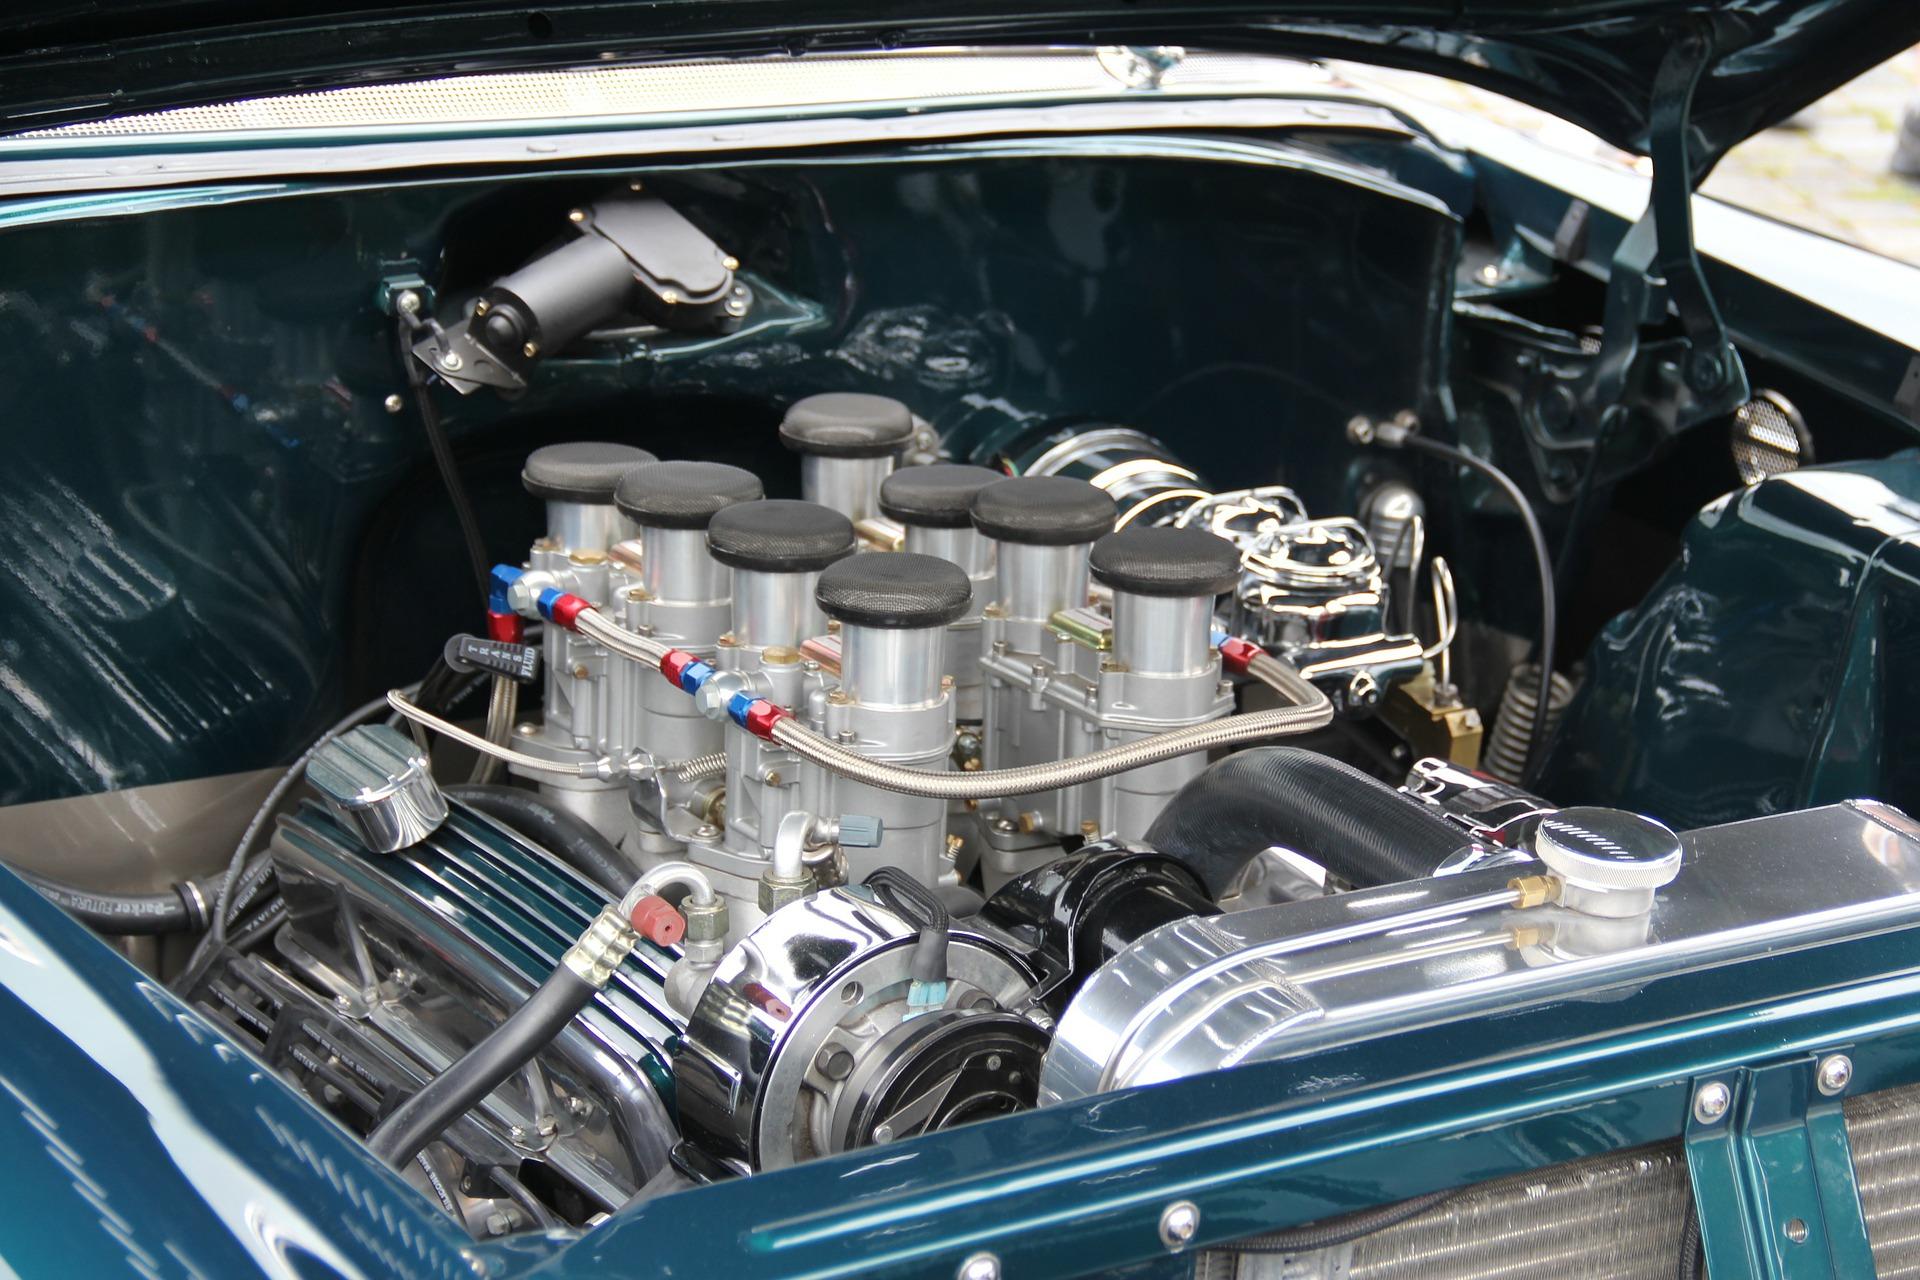 Motorraum eines Oldtimers